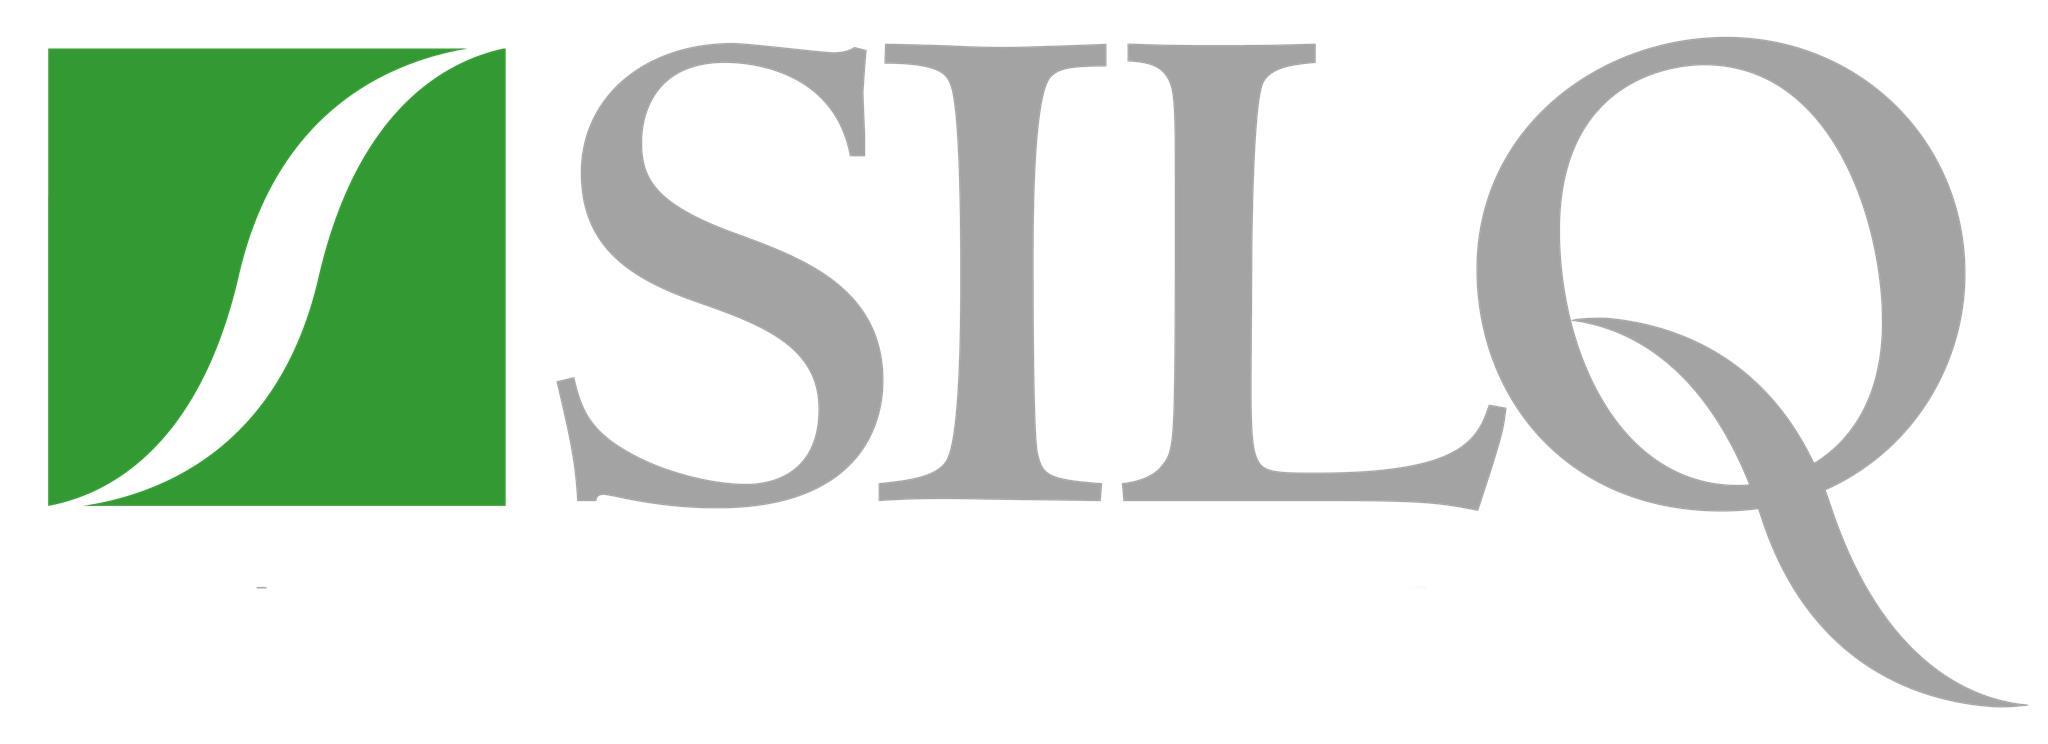 silq logo